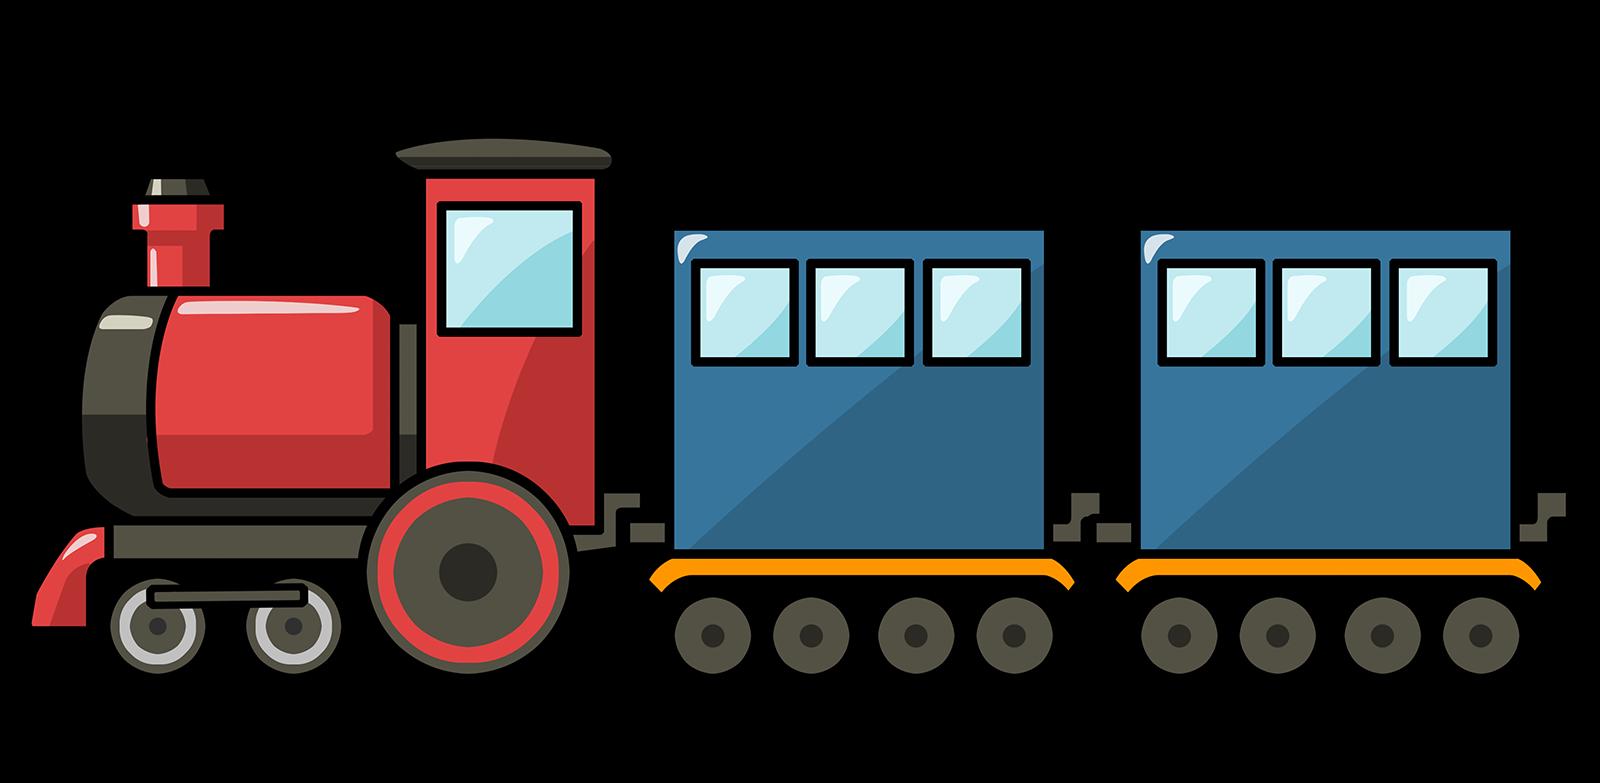 train engine clipart-train engine clipart-14